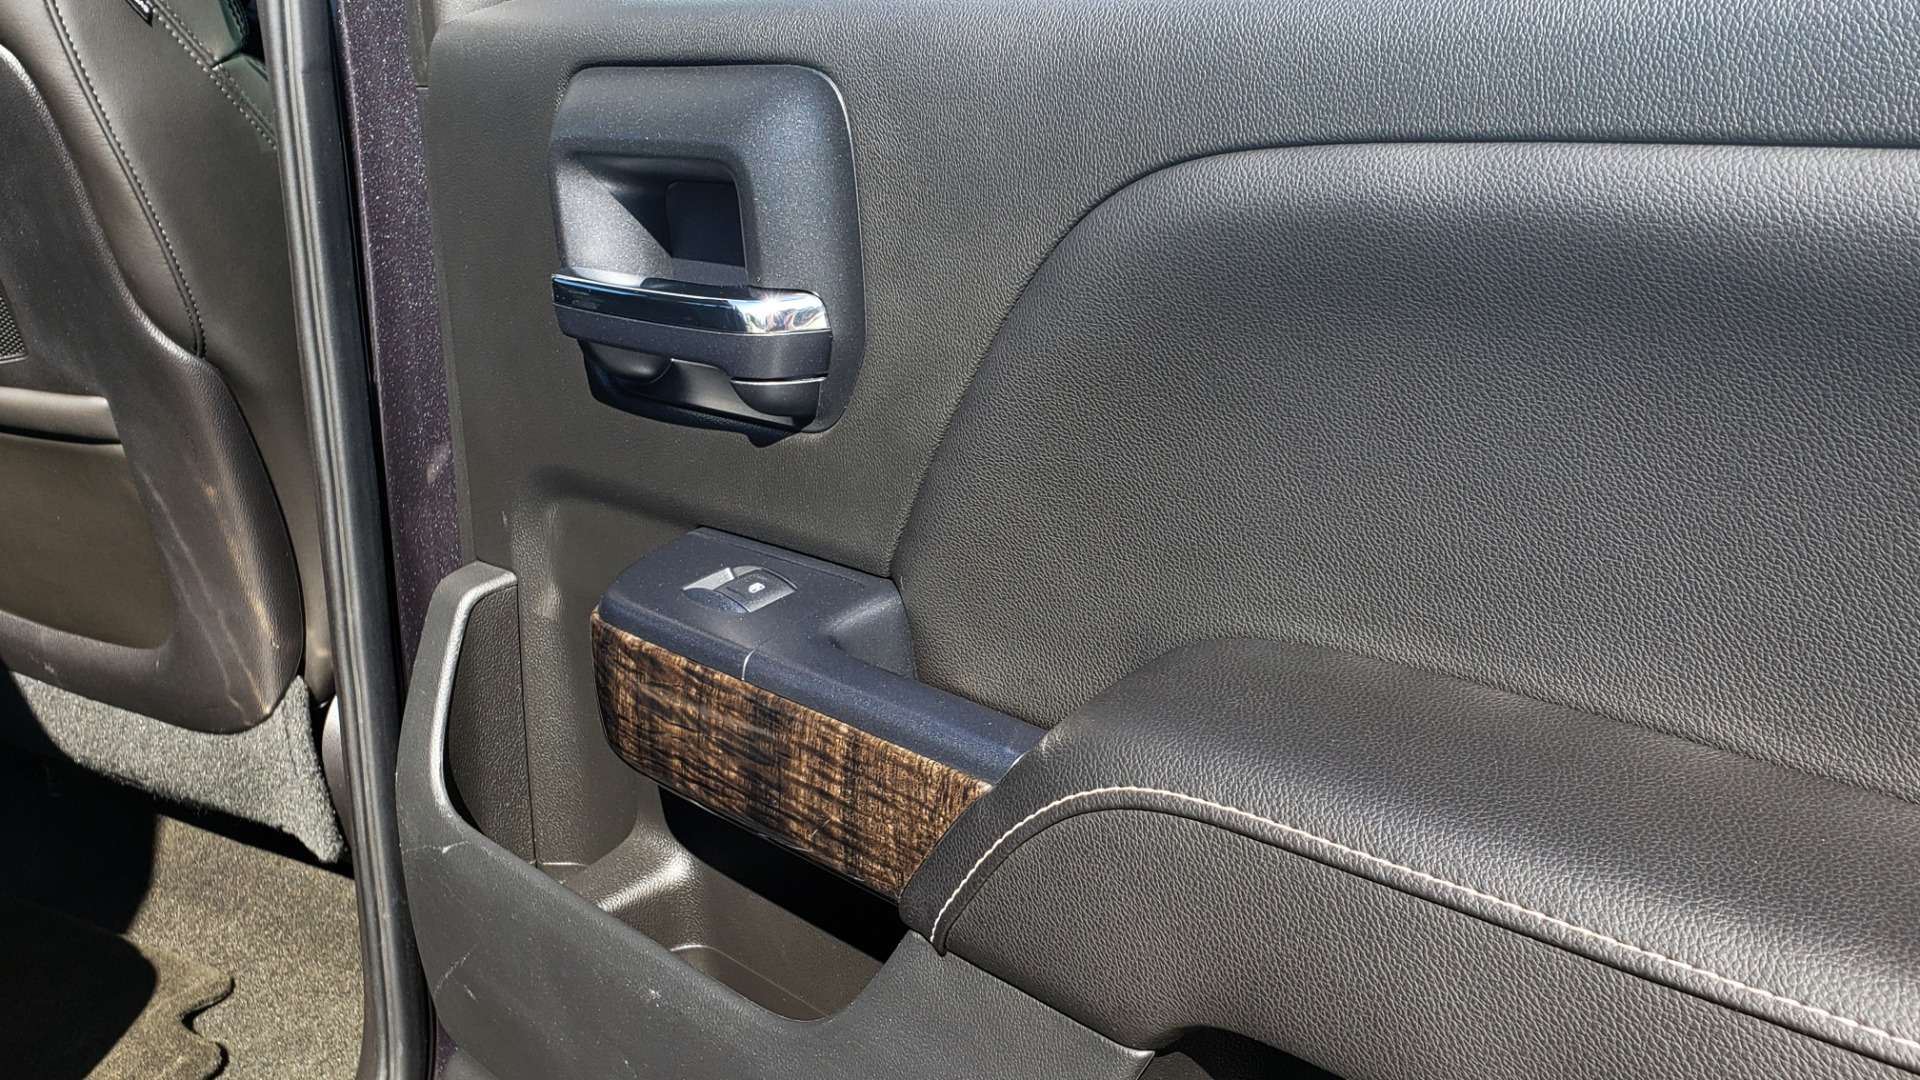 Used 2015 GMC SIERRA 2500HD DENALI 4WD CREWCAB / 6.6L DURAMAX / 6-SPD AUTO / NAV / BOSE for sale $50,995 at Formula Imports in Charlotte NC 28227 80